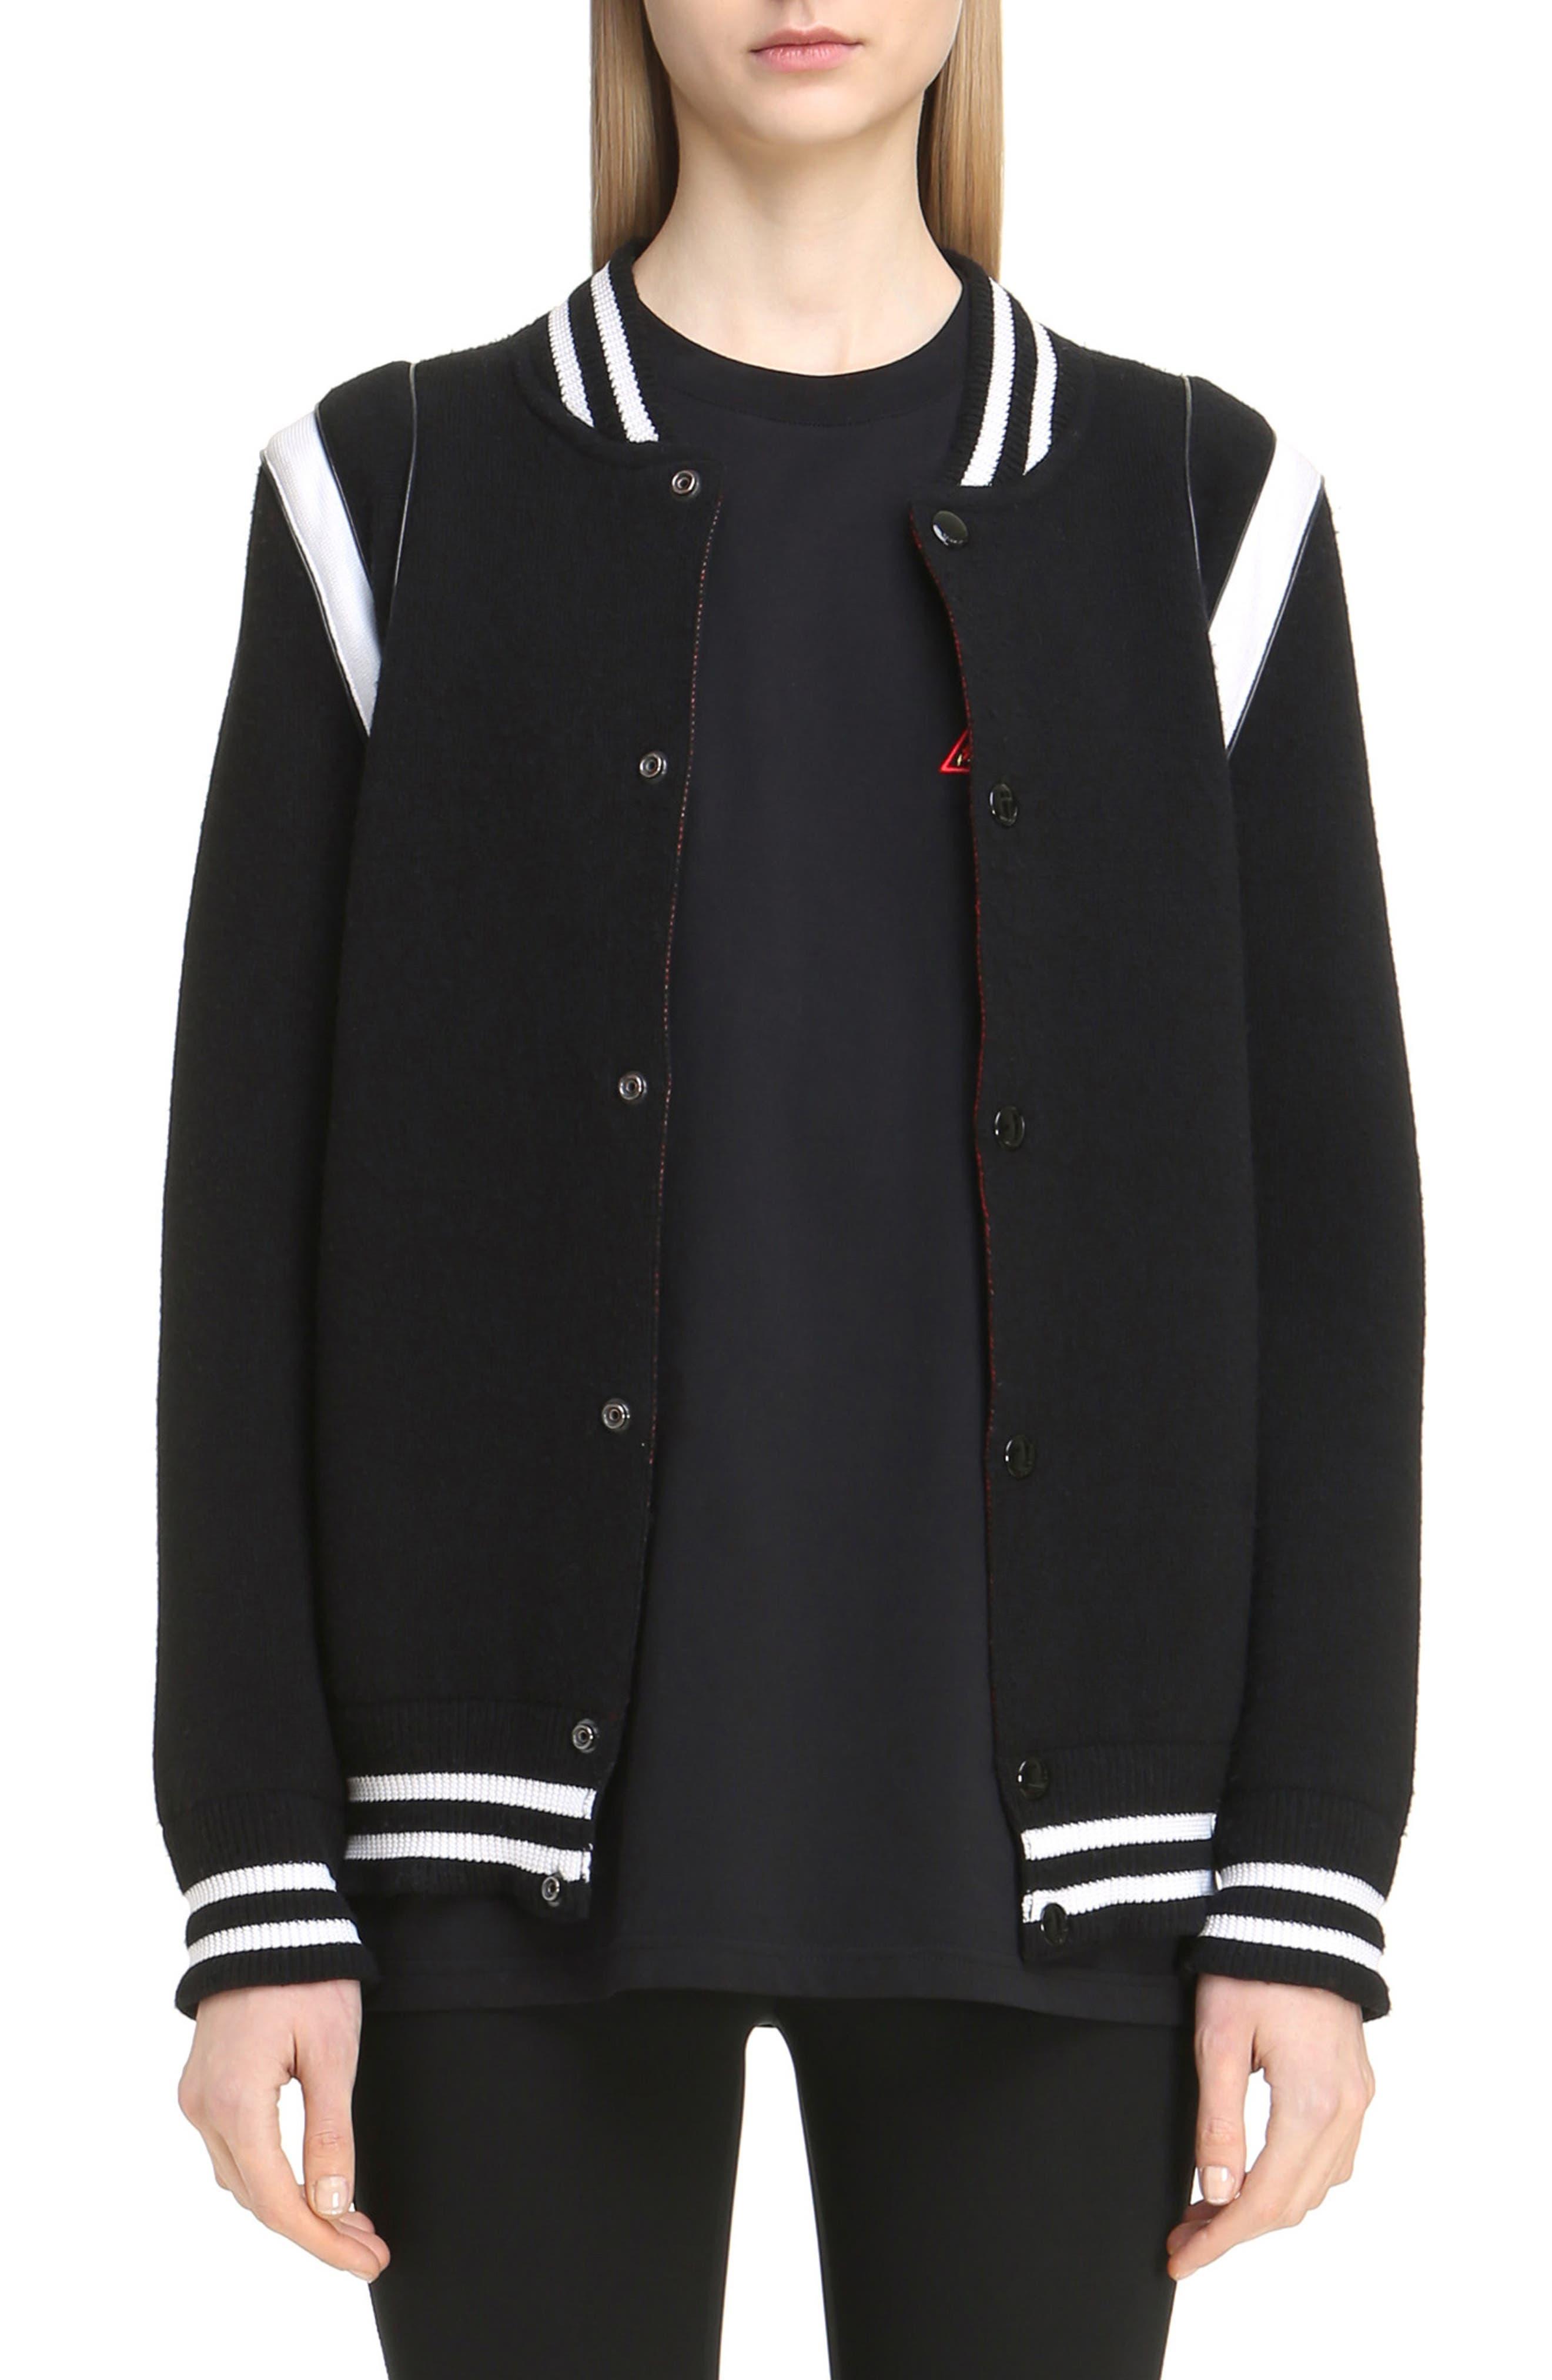 Main Image - Givenchy Contrast Knit Trim Logo Bomber Jacket